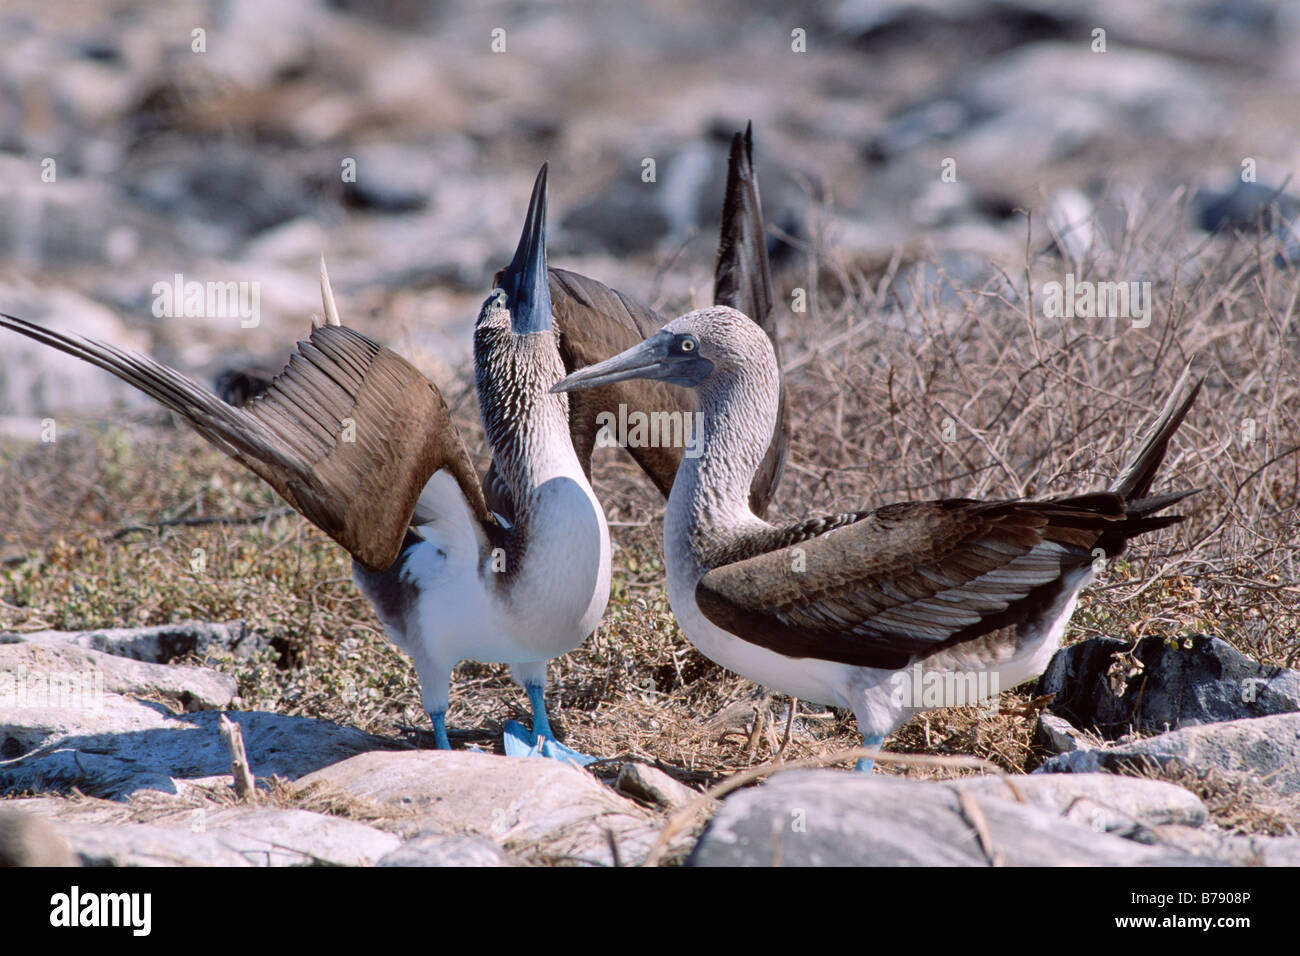 Blue-footed Booby pair (Sula nebouxii) courtship dance, Insel Espanola, Galapagos Inseln, Galapagos Islands, Ecuador, - Stock Image